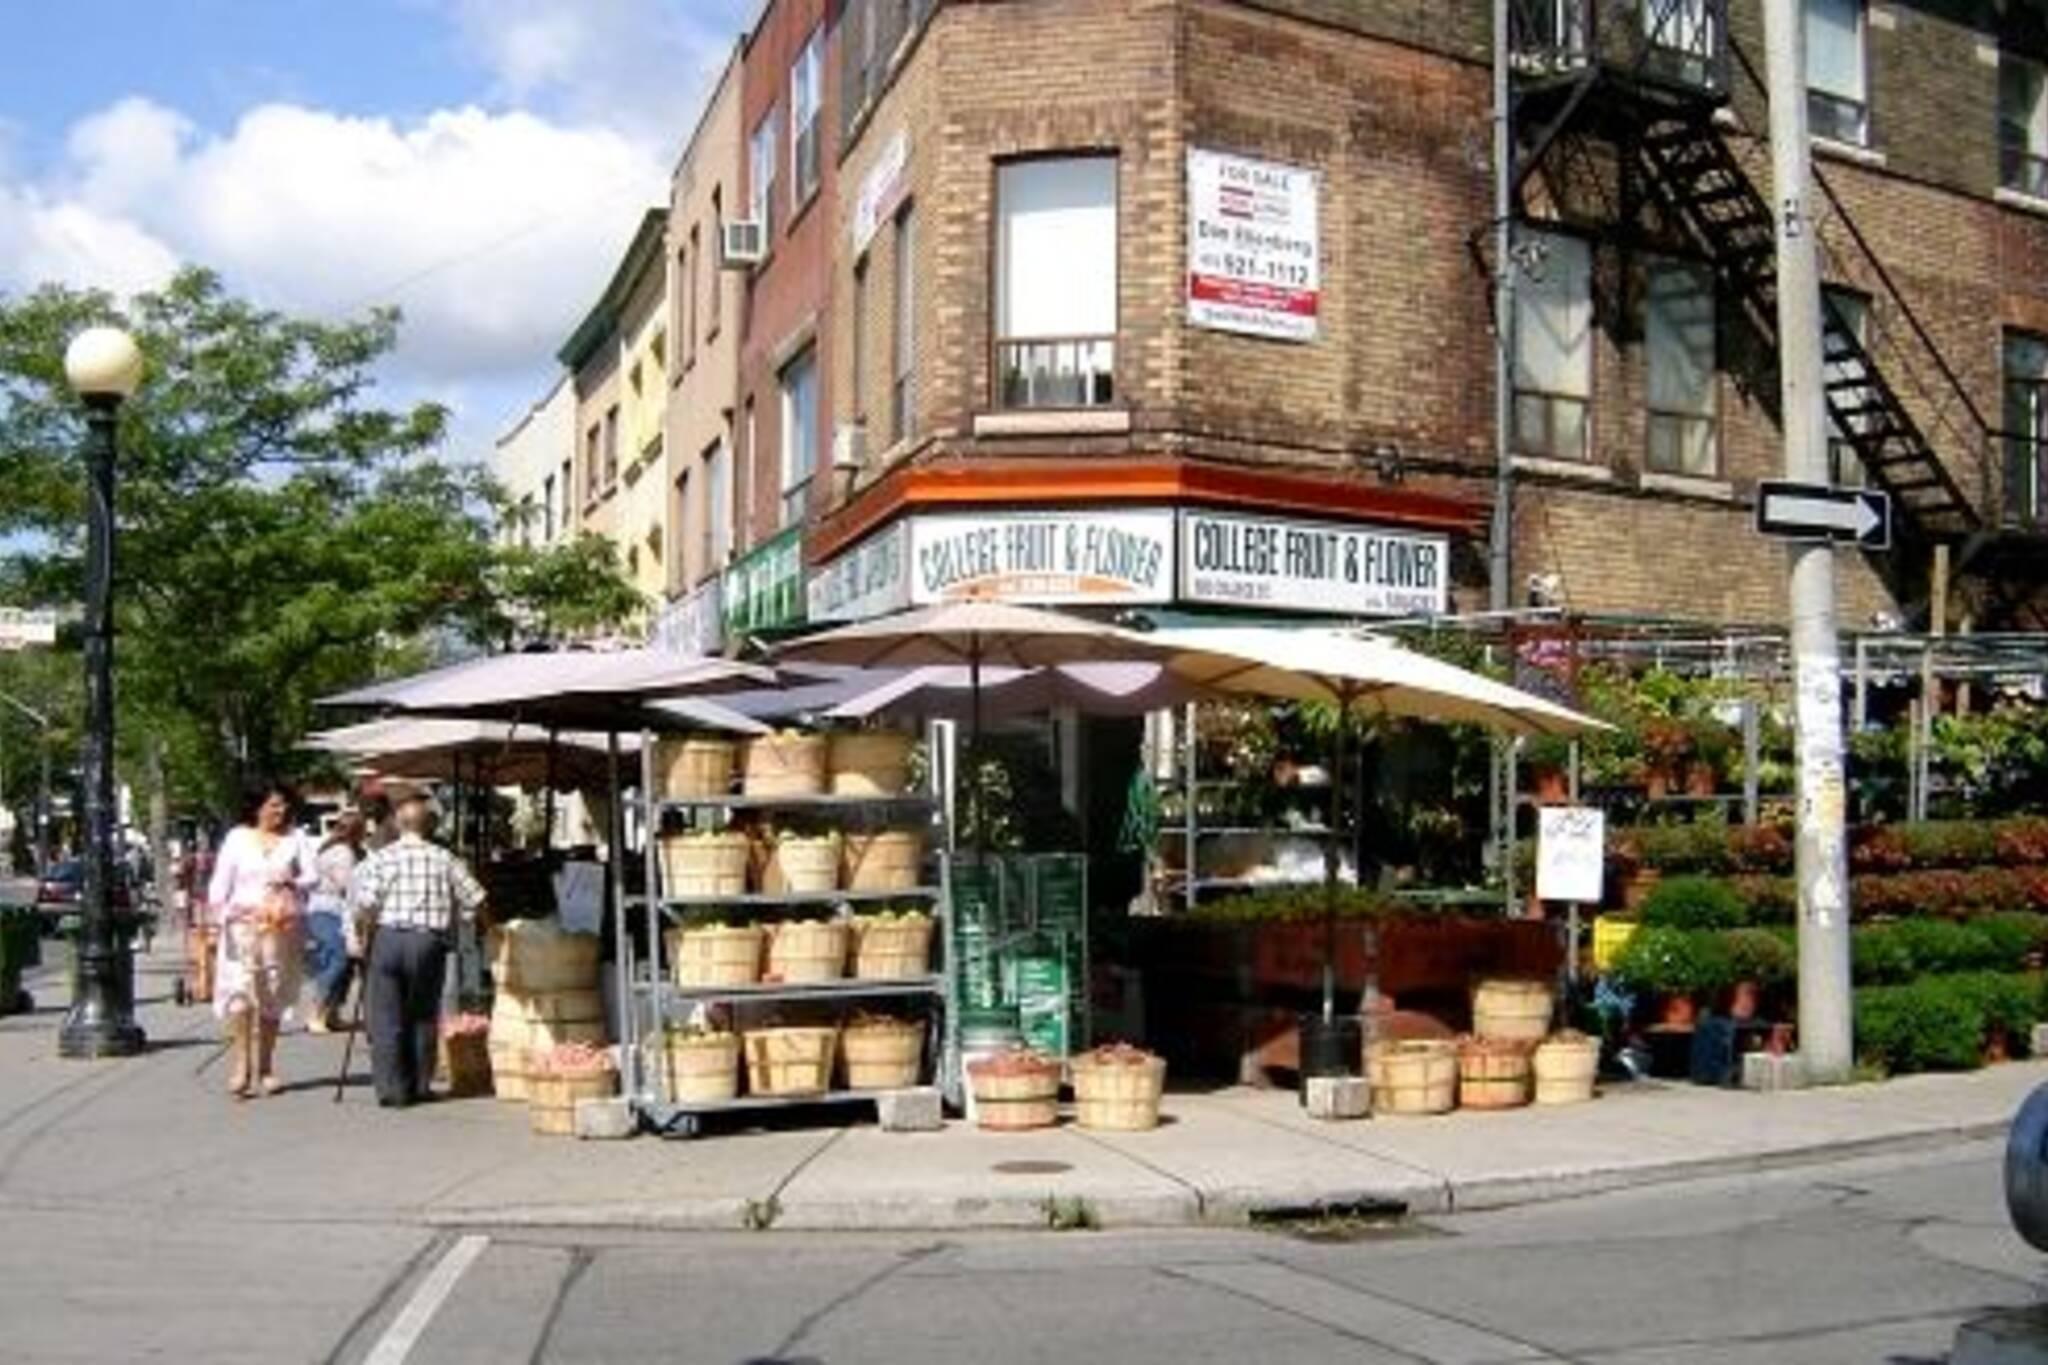 College Fruit Market